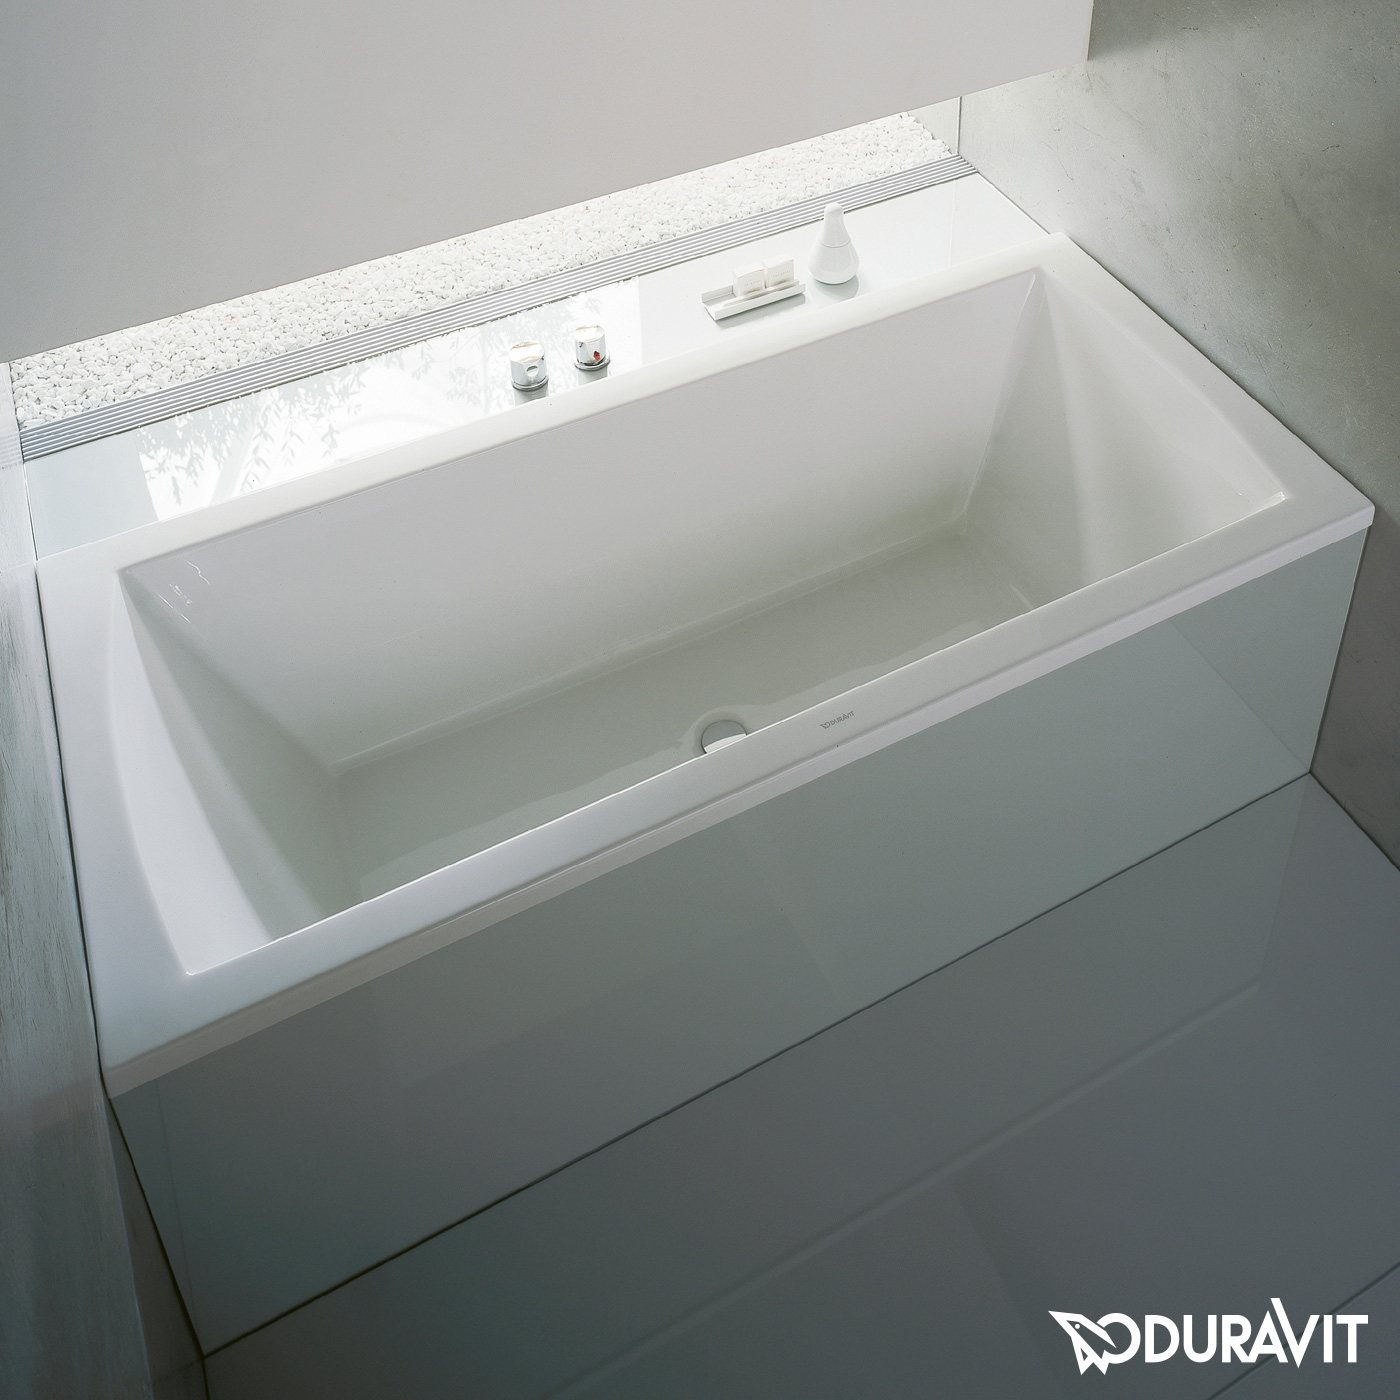 badewanne modell duravit starck kreative ideen f r. Black Bedroom Furniture Sets. Home Design Ideas